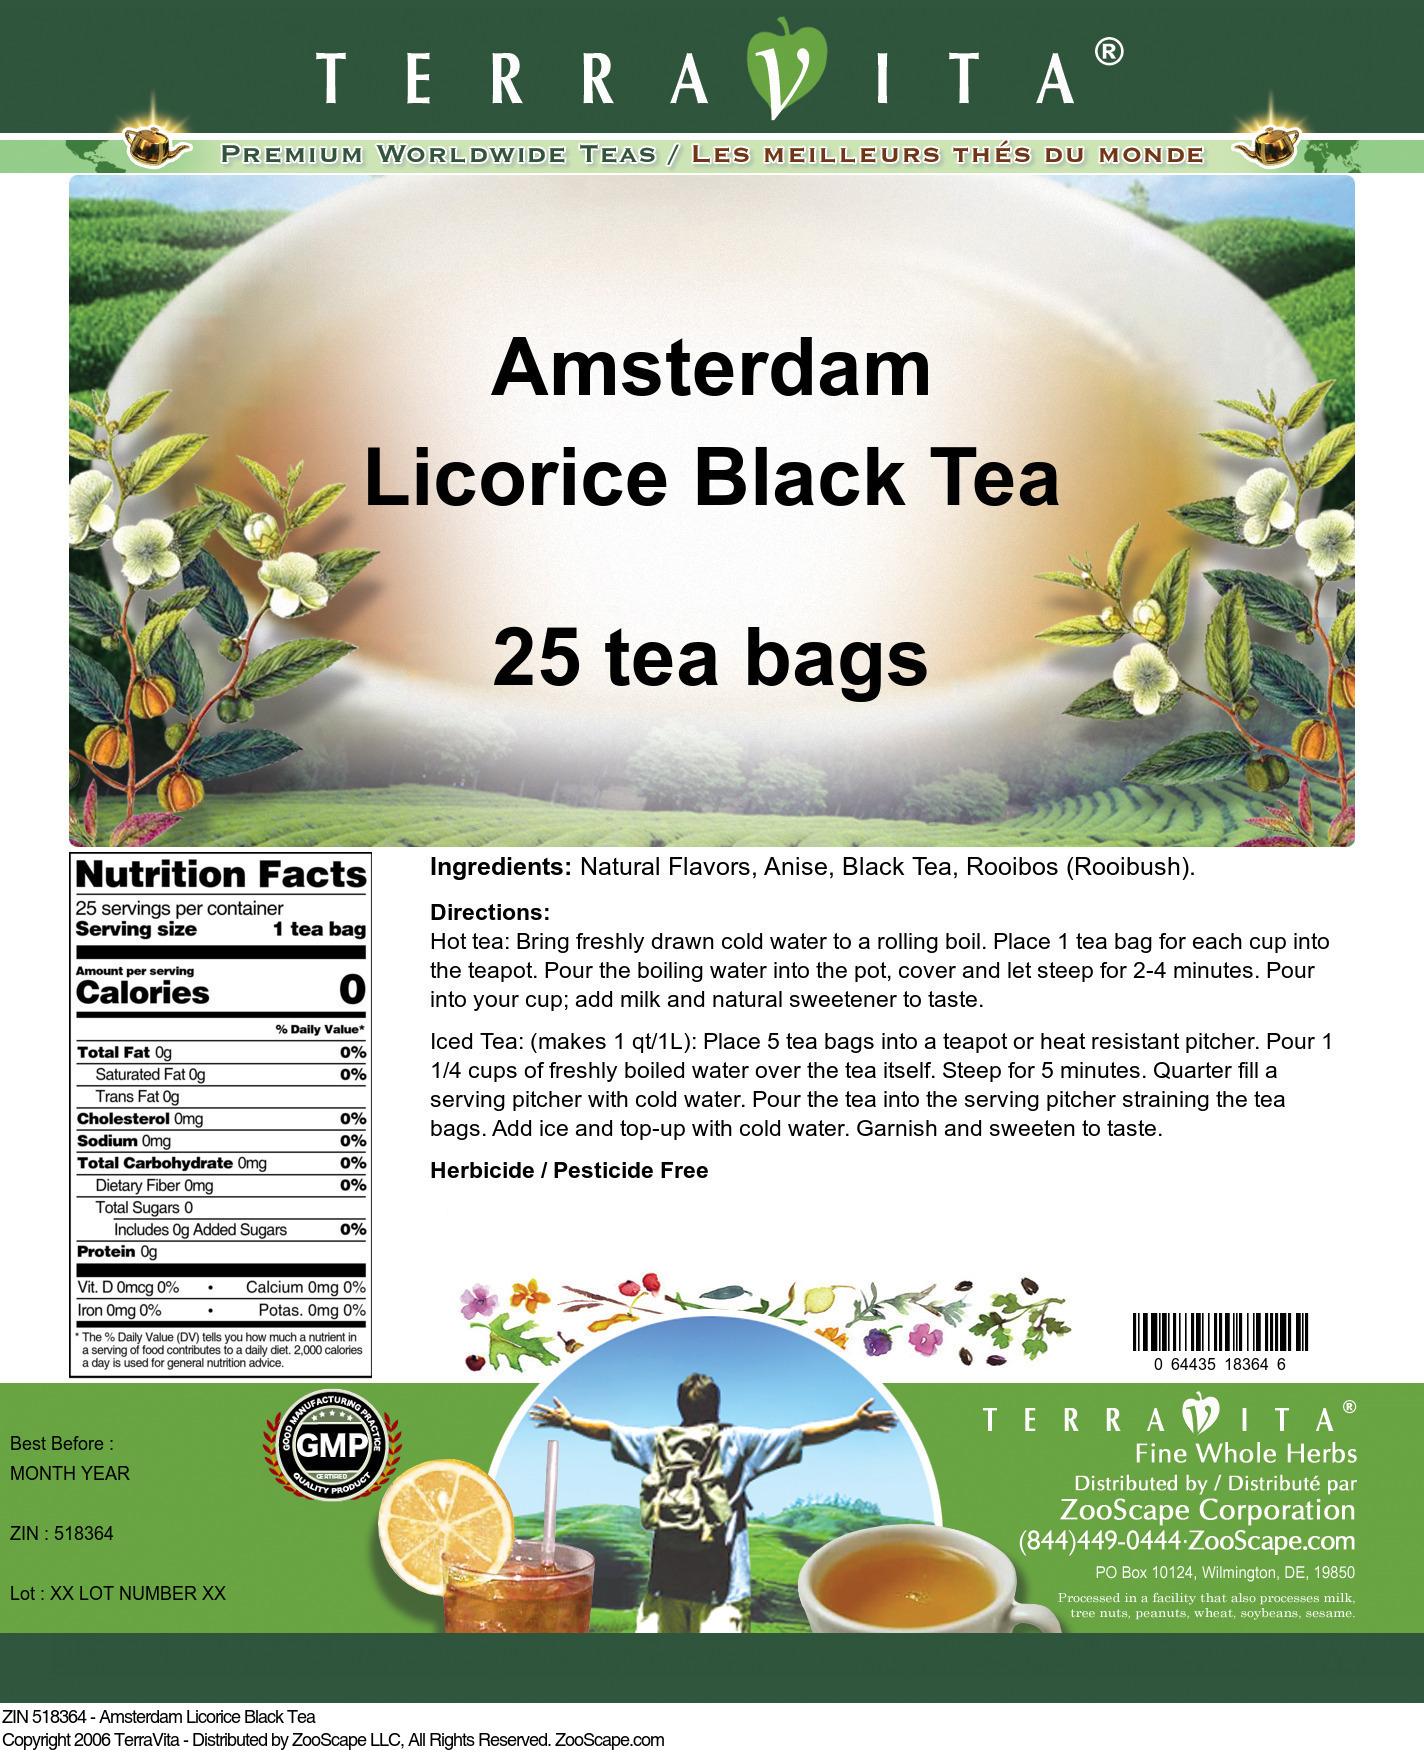 Amsterdam Licorice Black Tea